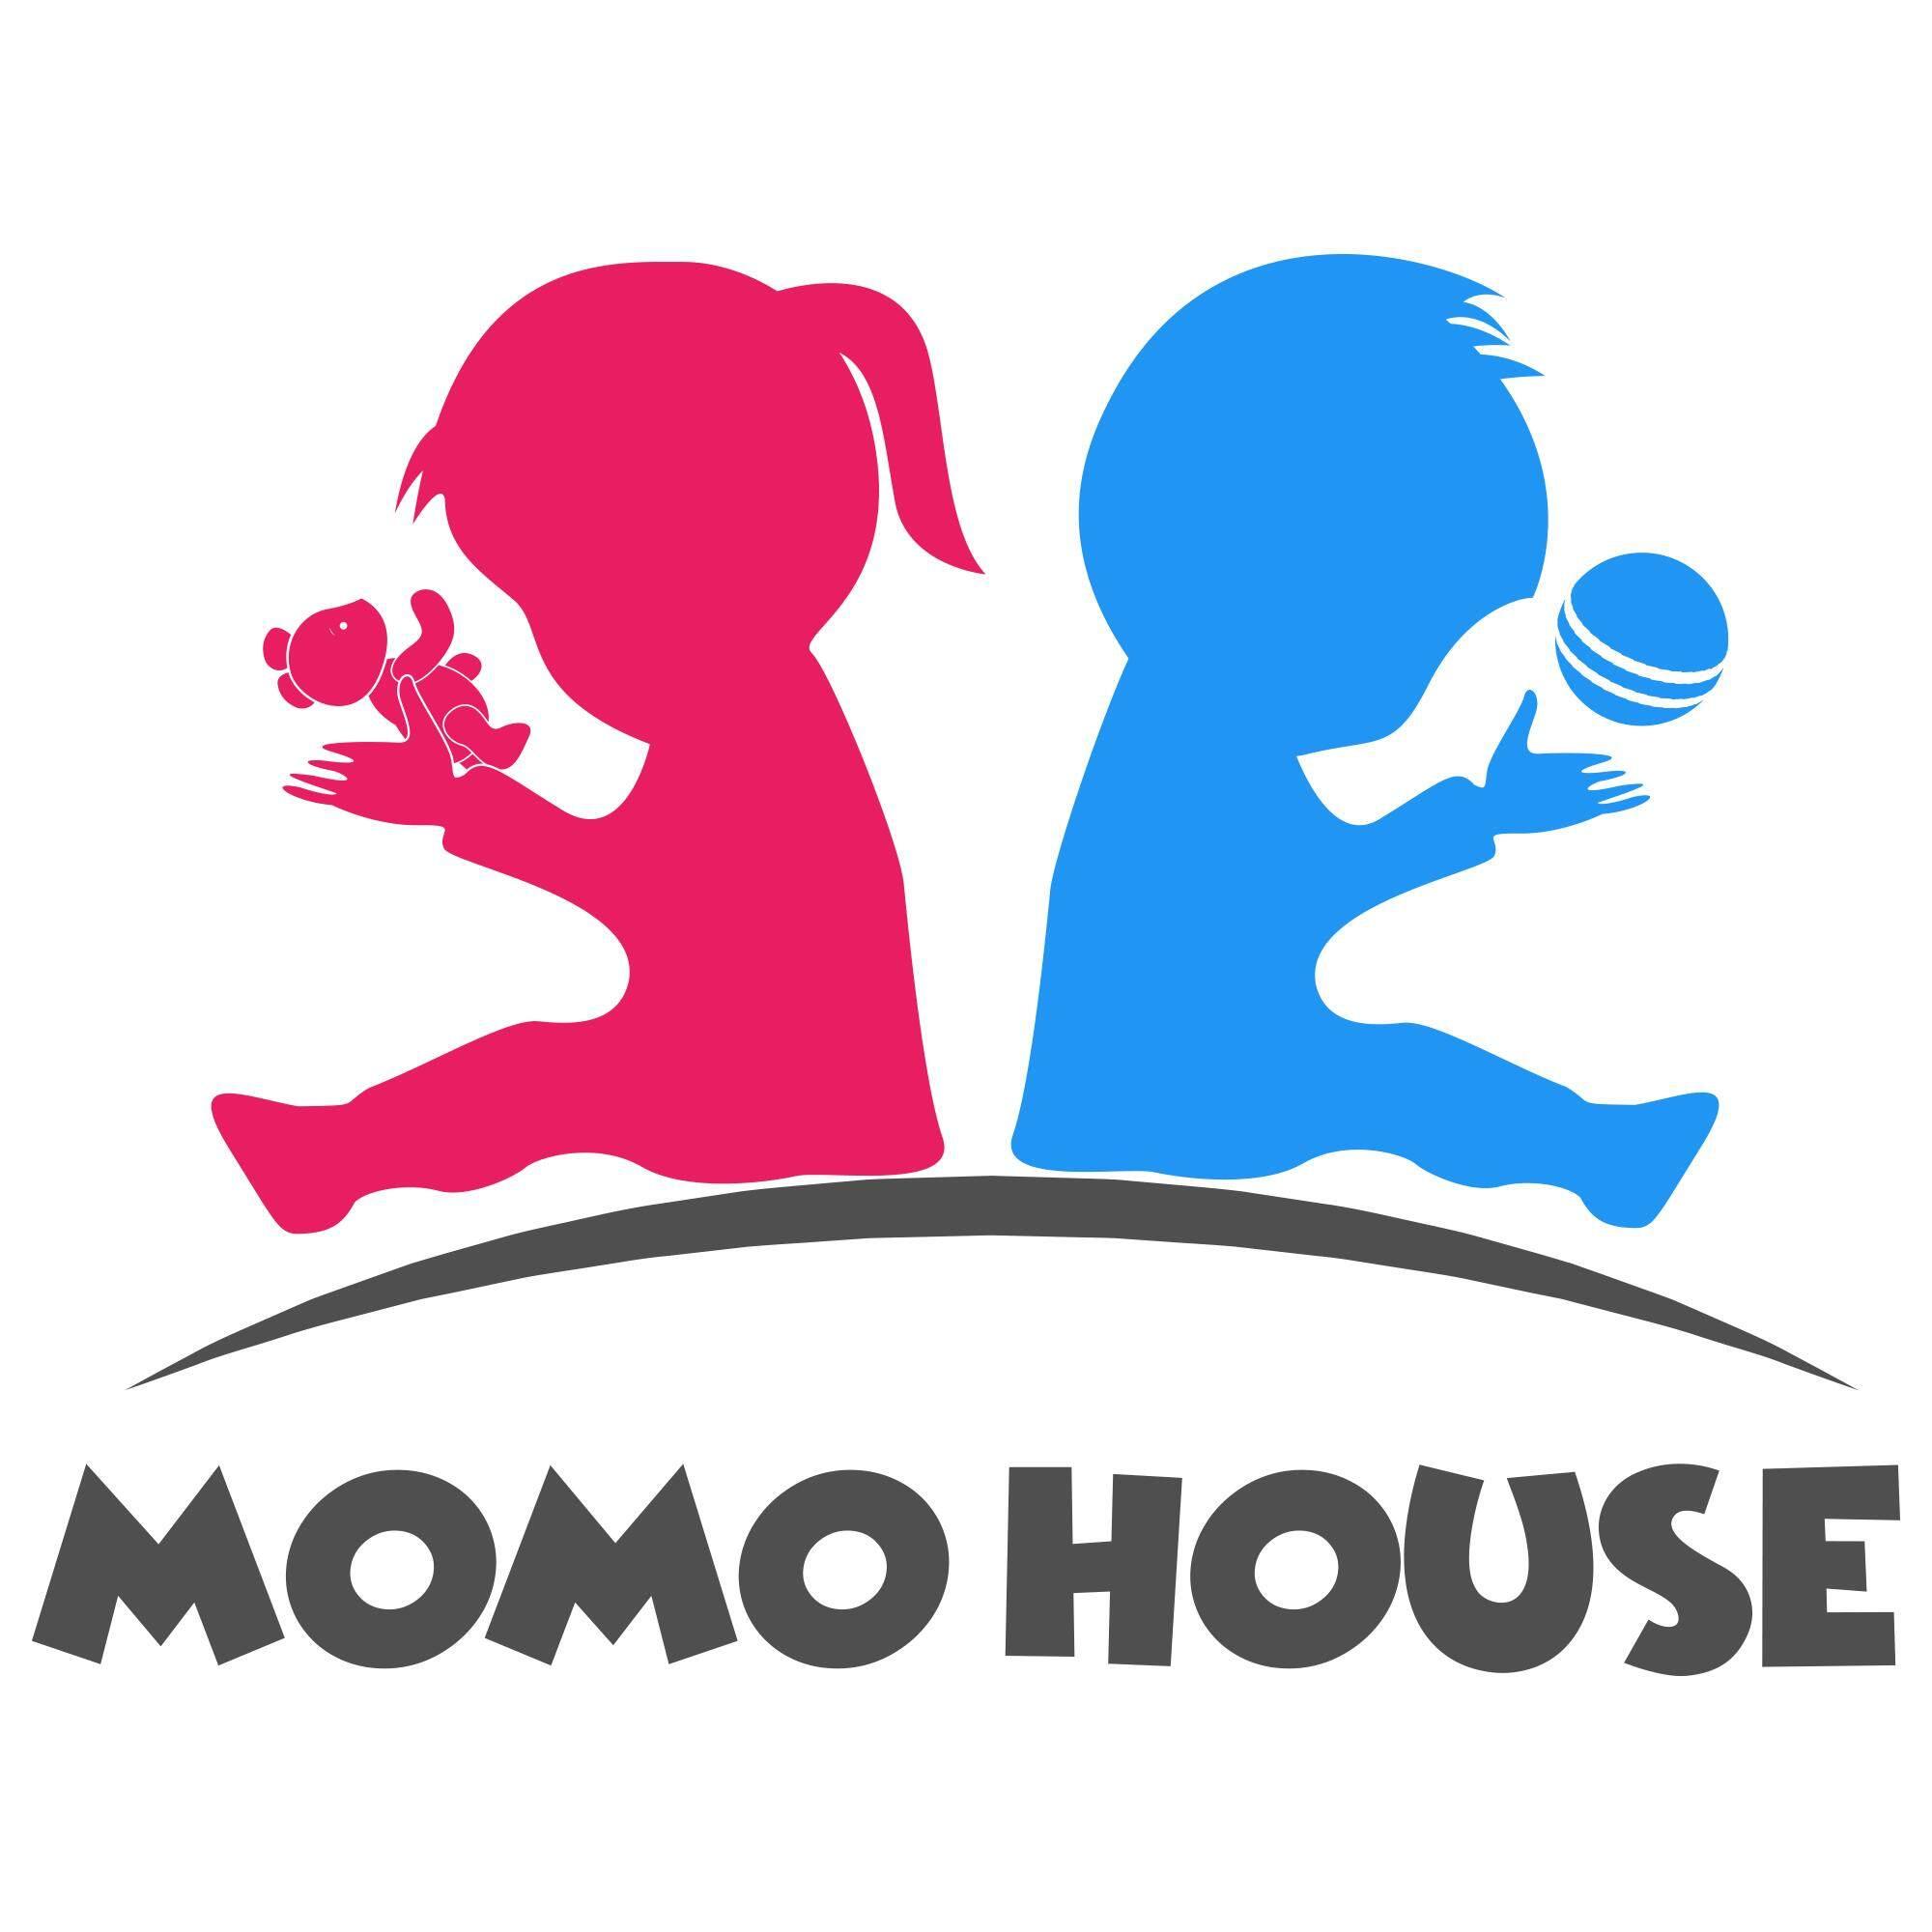 Momo_House_logo.png